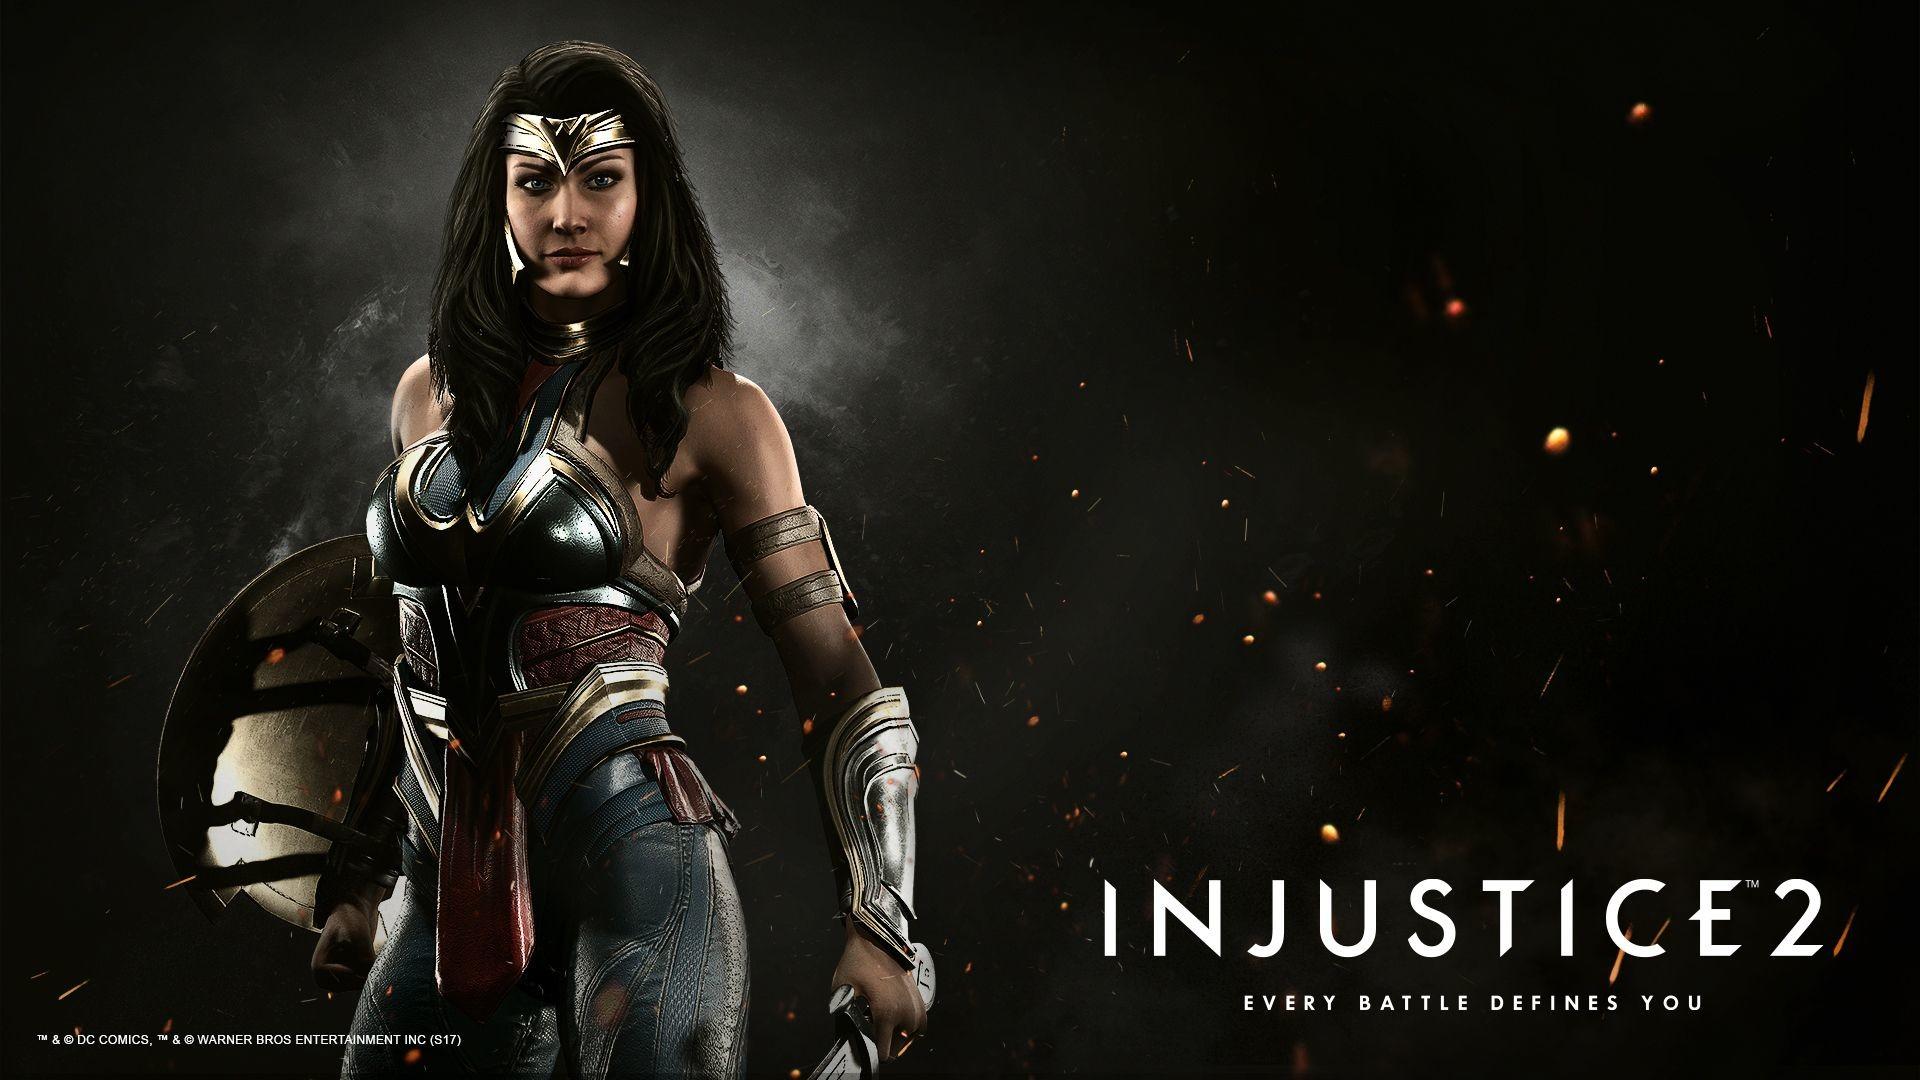 Res: 1920x1080, Injustice2-WONDER-WOMAN-wallpaper--45.jpg